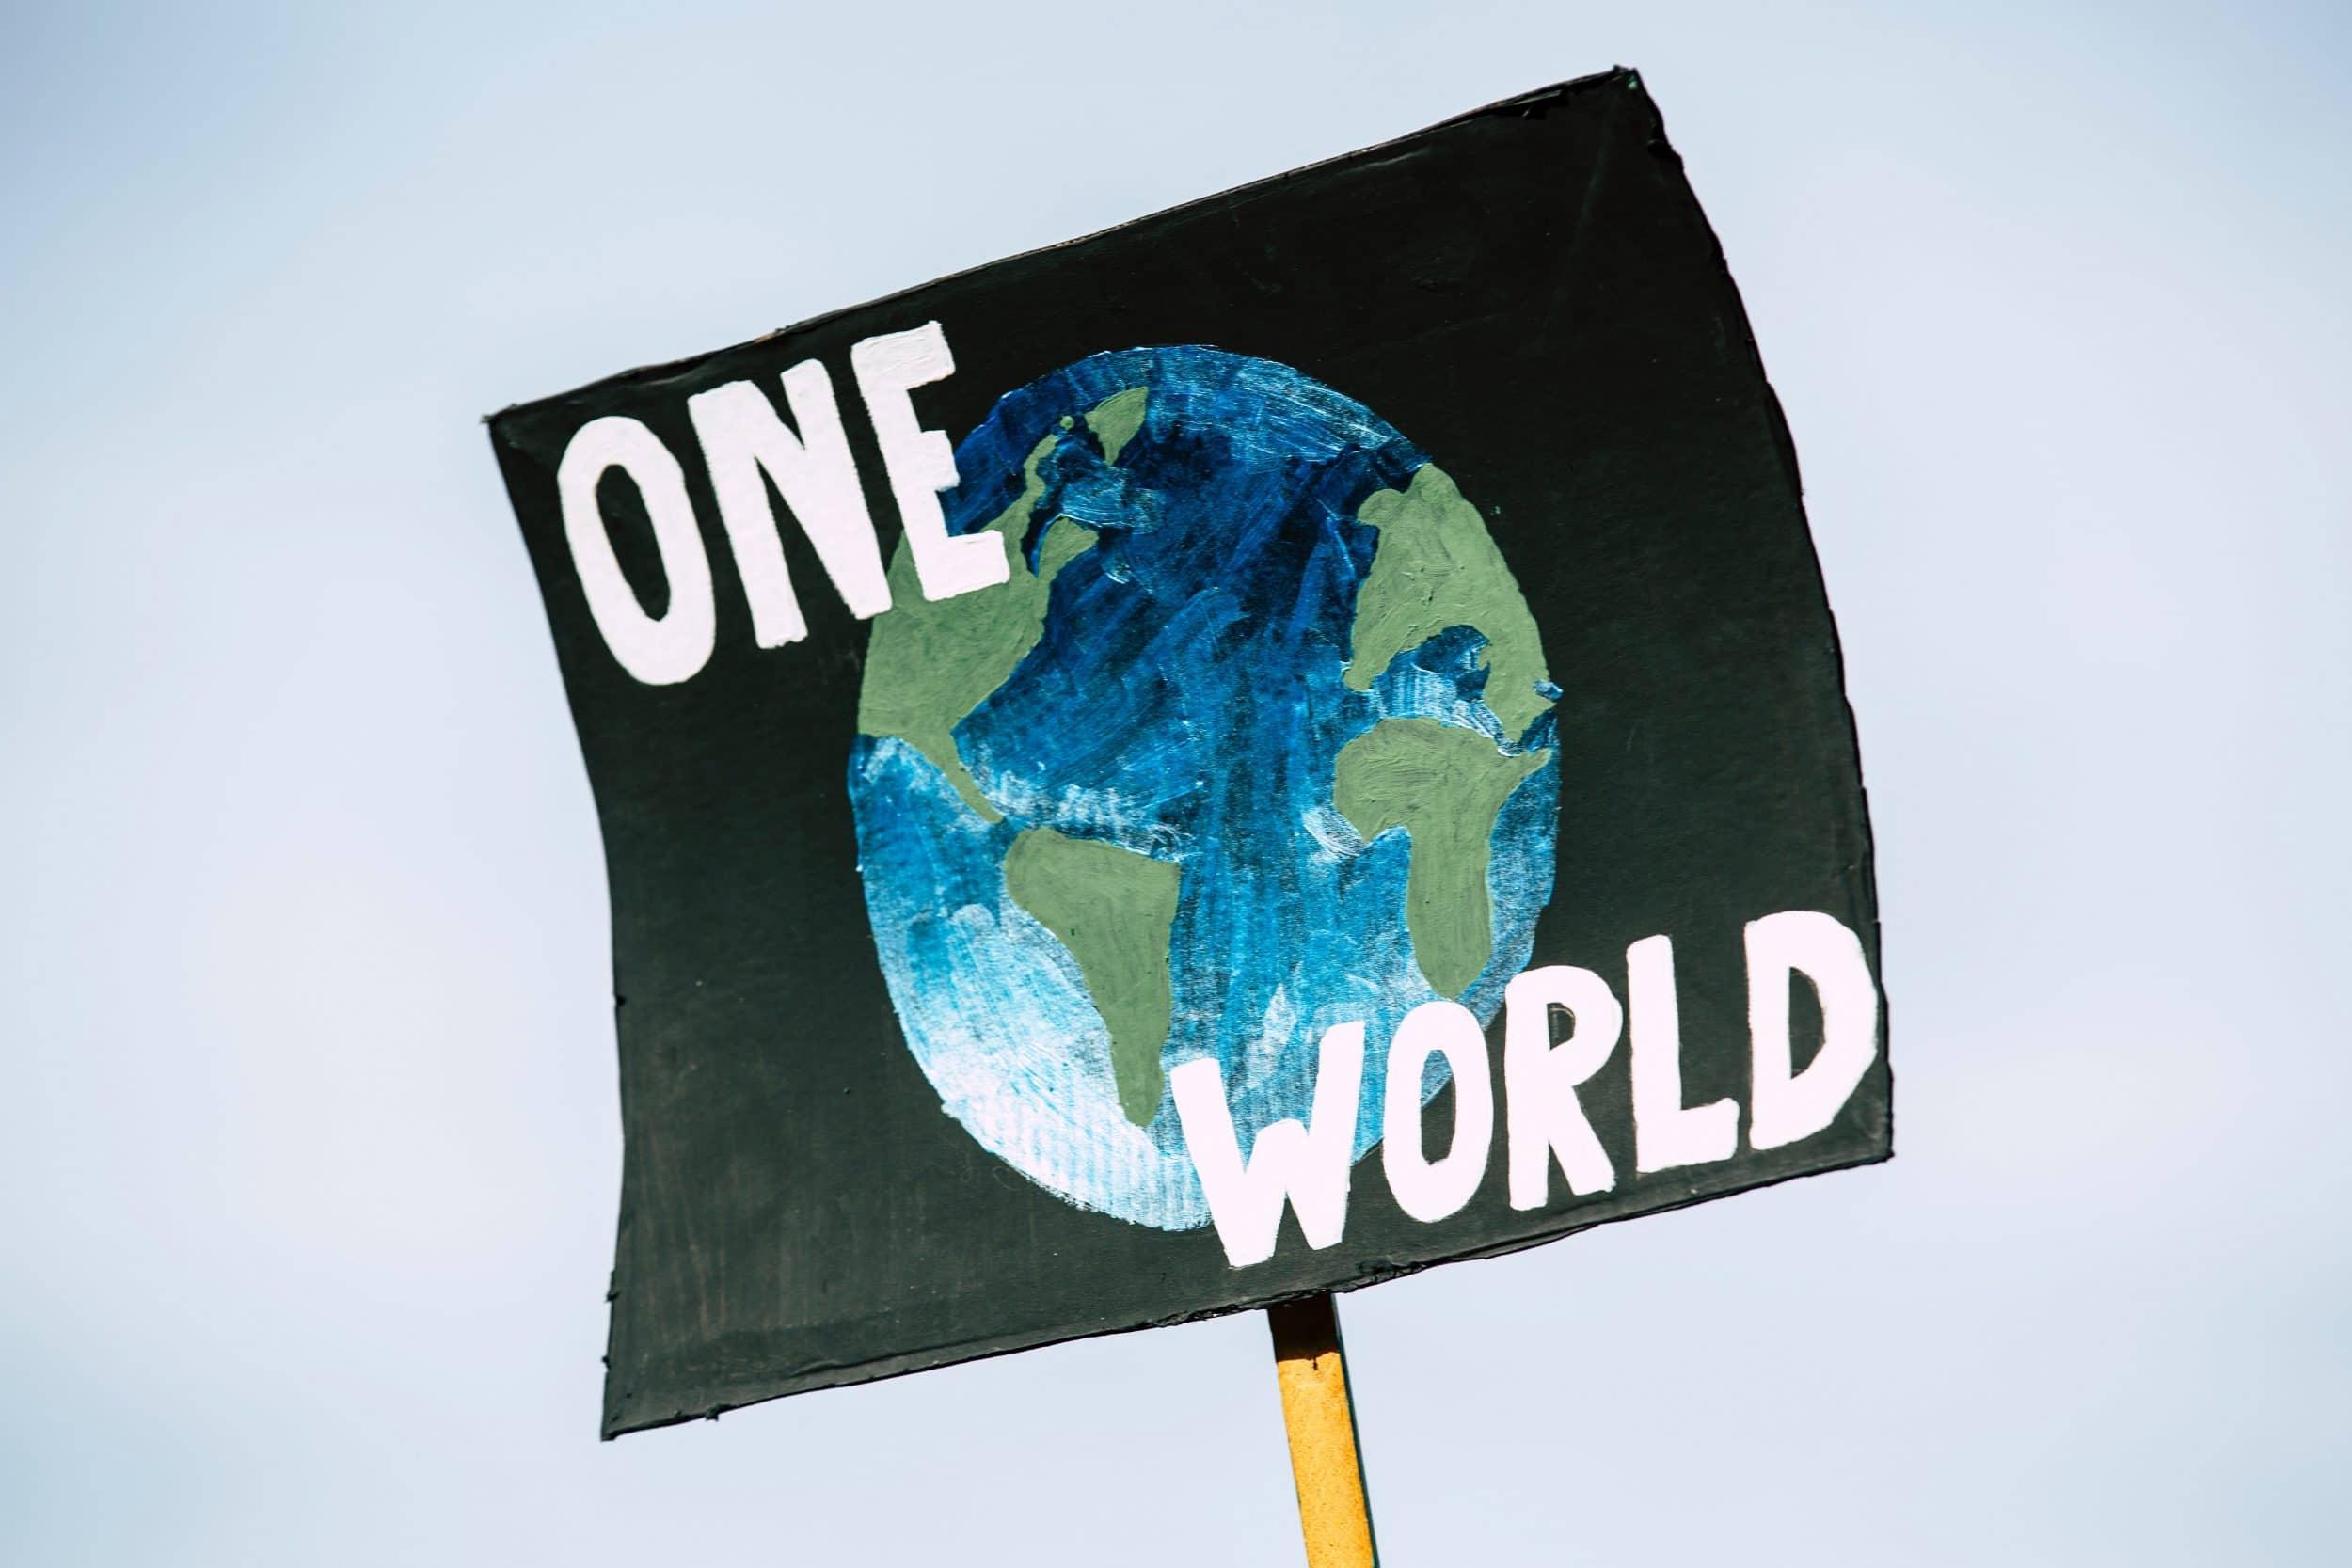 Cardboard placard saying one world